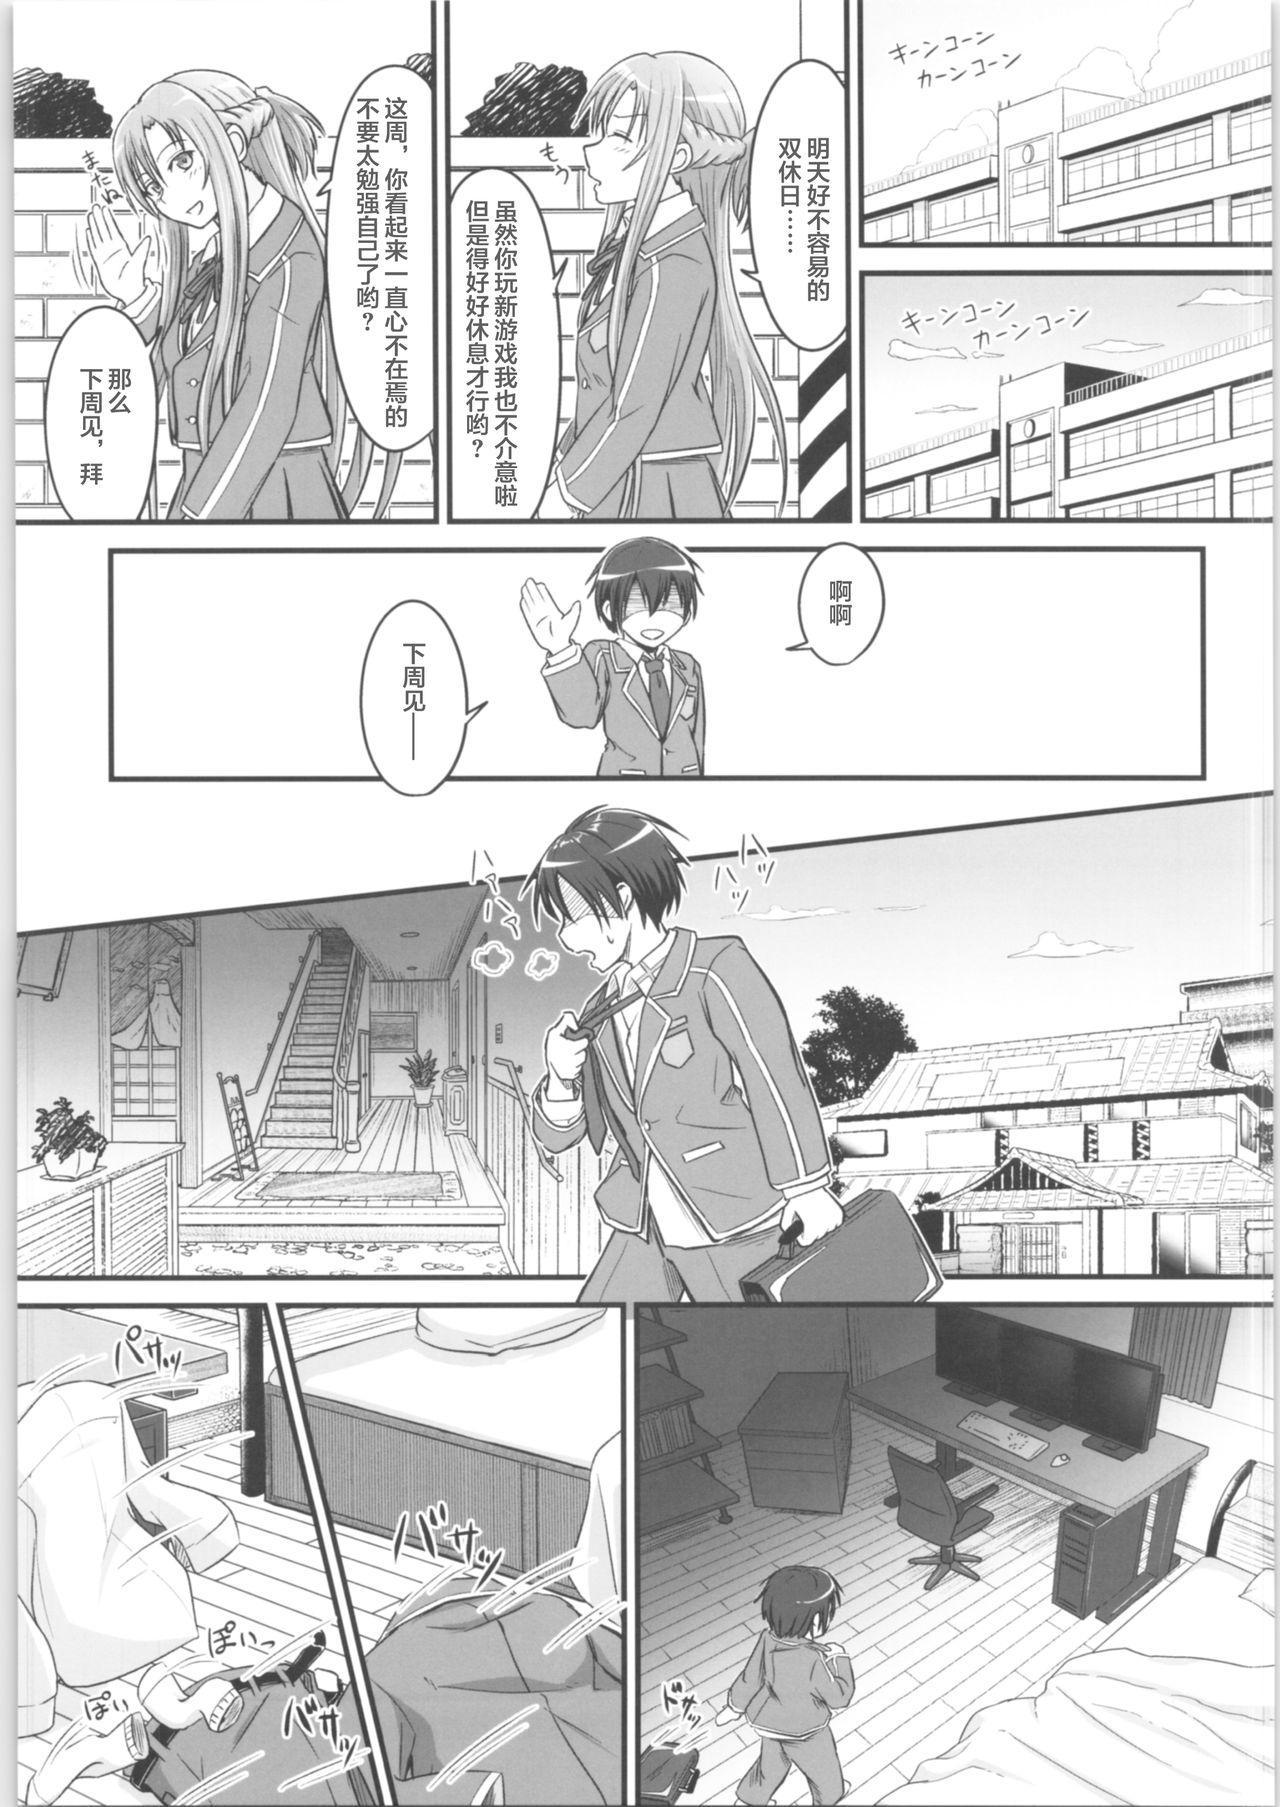 [Umari-ya (D-2)] Kiriko Route Another #02 ~Shitagi Josou Jii Kyouyou Hen~ (Sword Art Online)[Chinese]【不可视汉化】 22